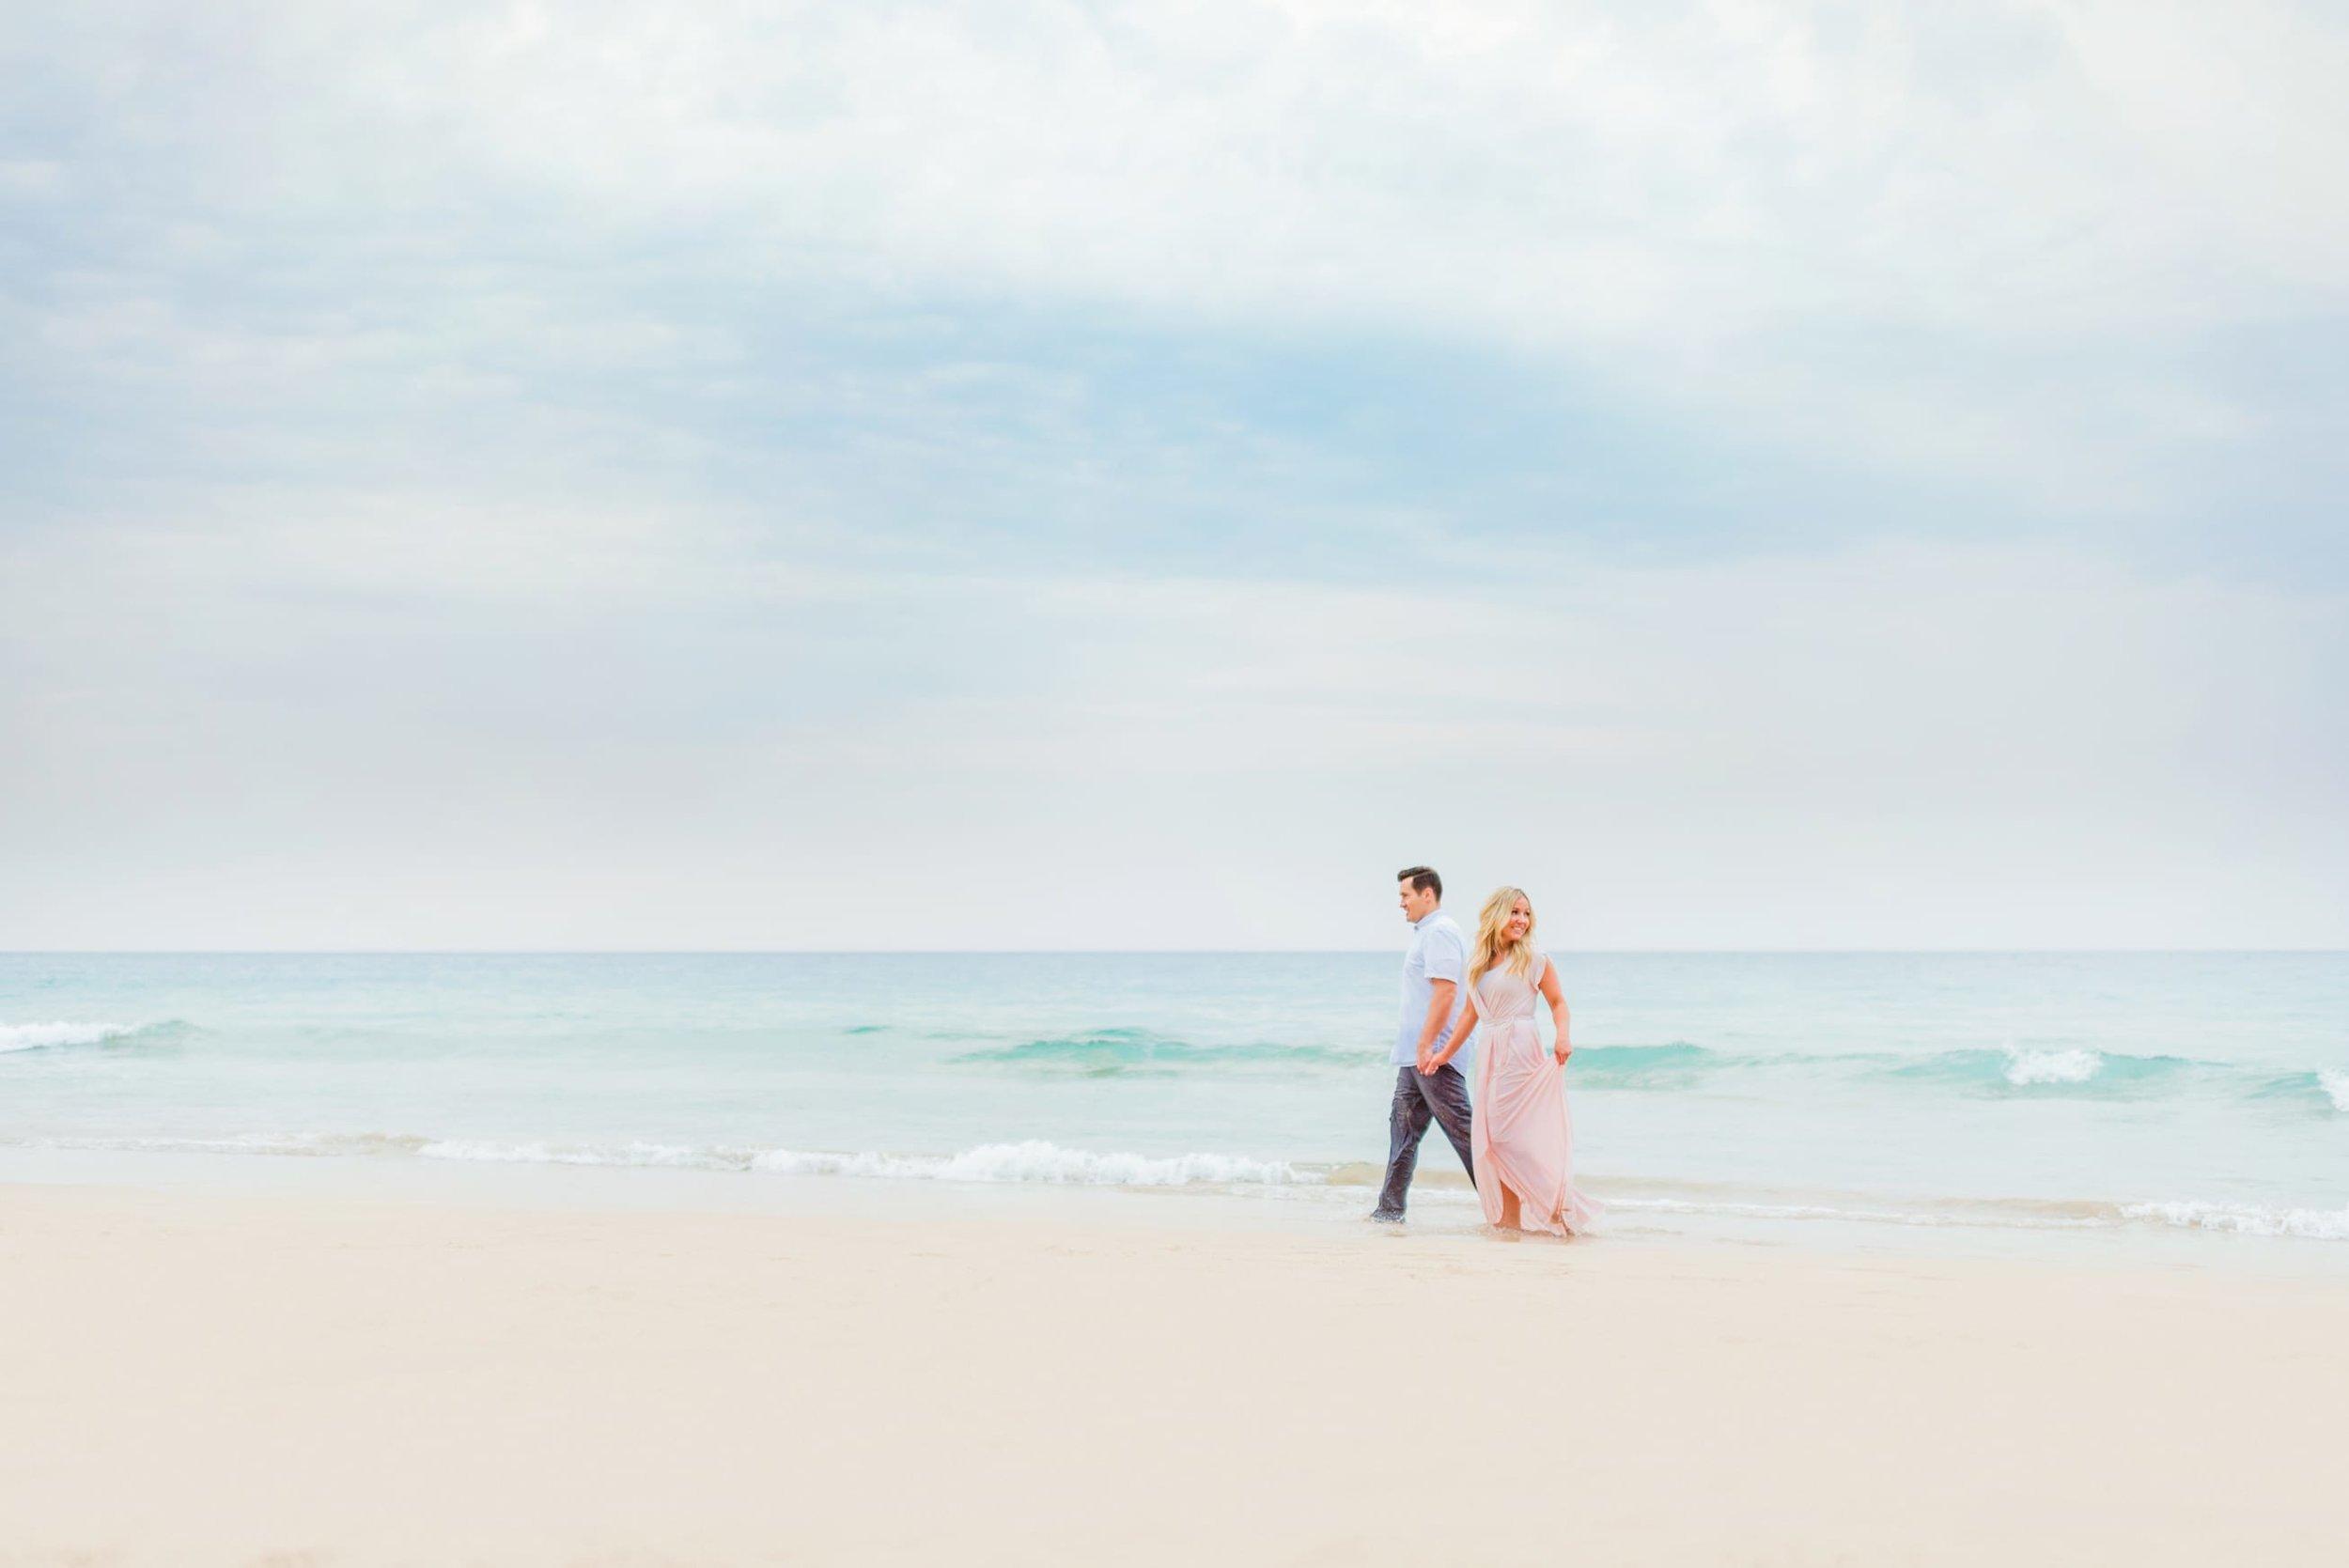 Hapuna-Beach-Resort-Hawaii-Family-Photographer-18.jpg